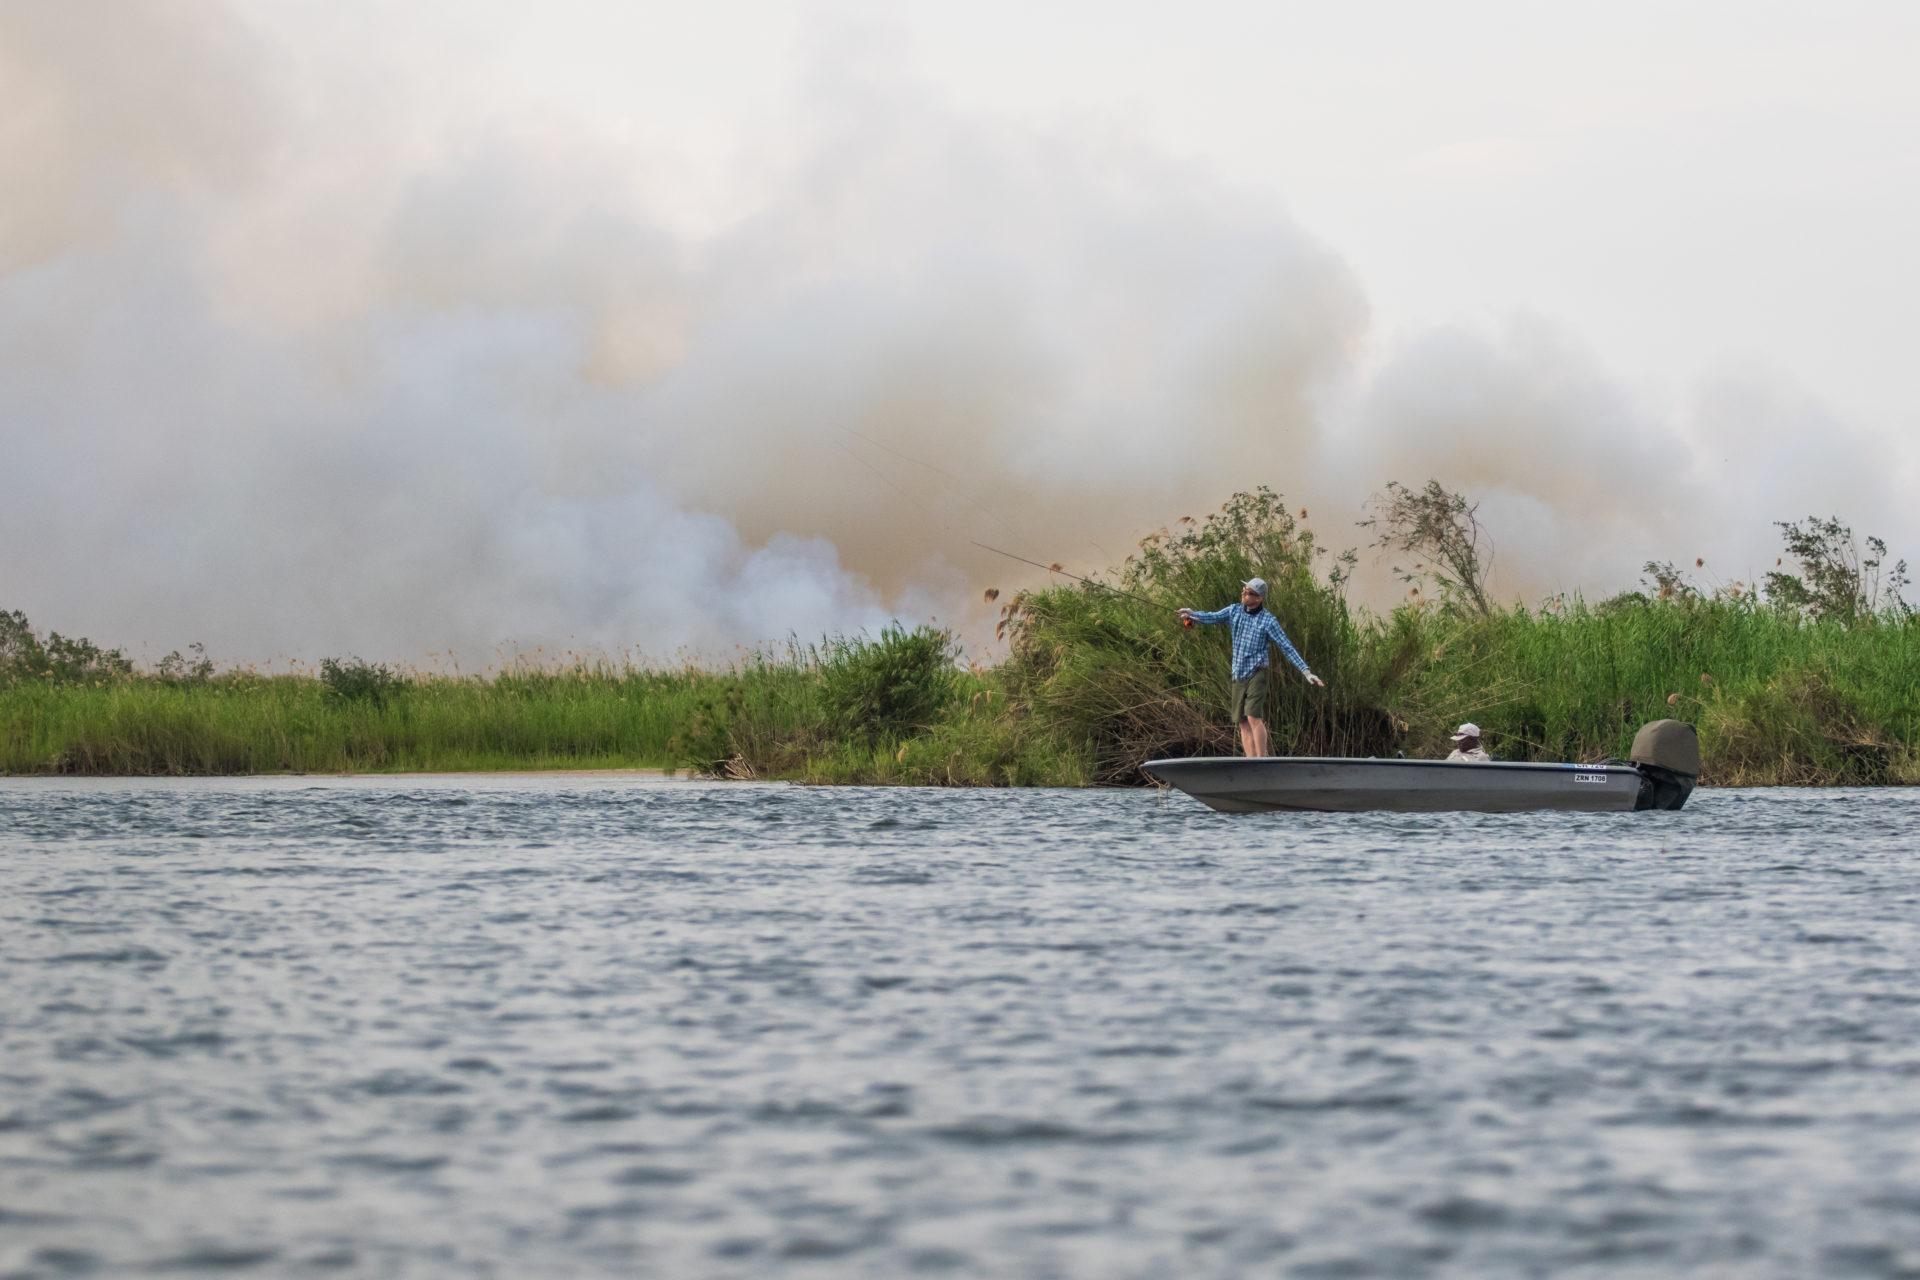 Tigerfishing on the Chobe